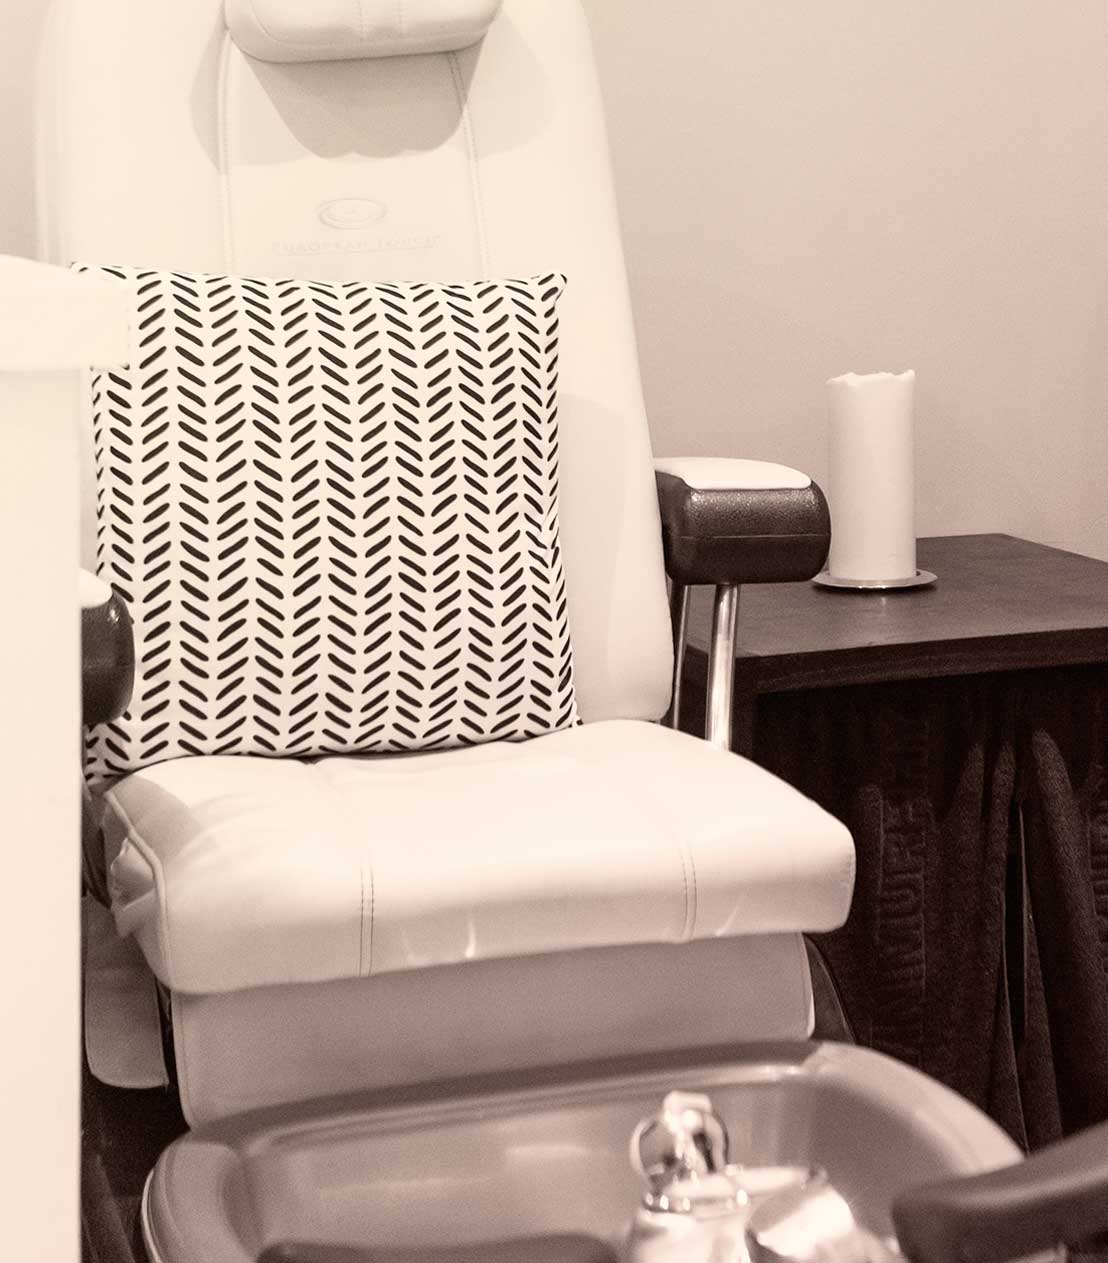 Pedicure chair at Hair salon in Naples, Florida